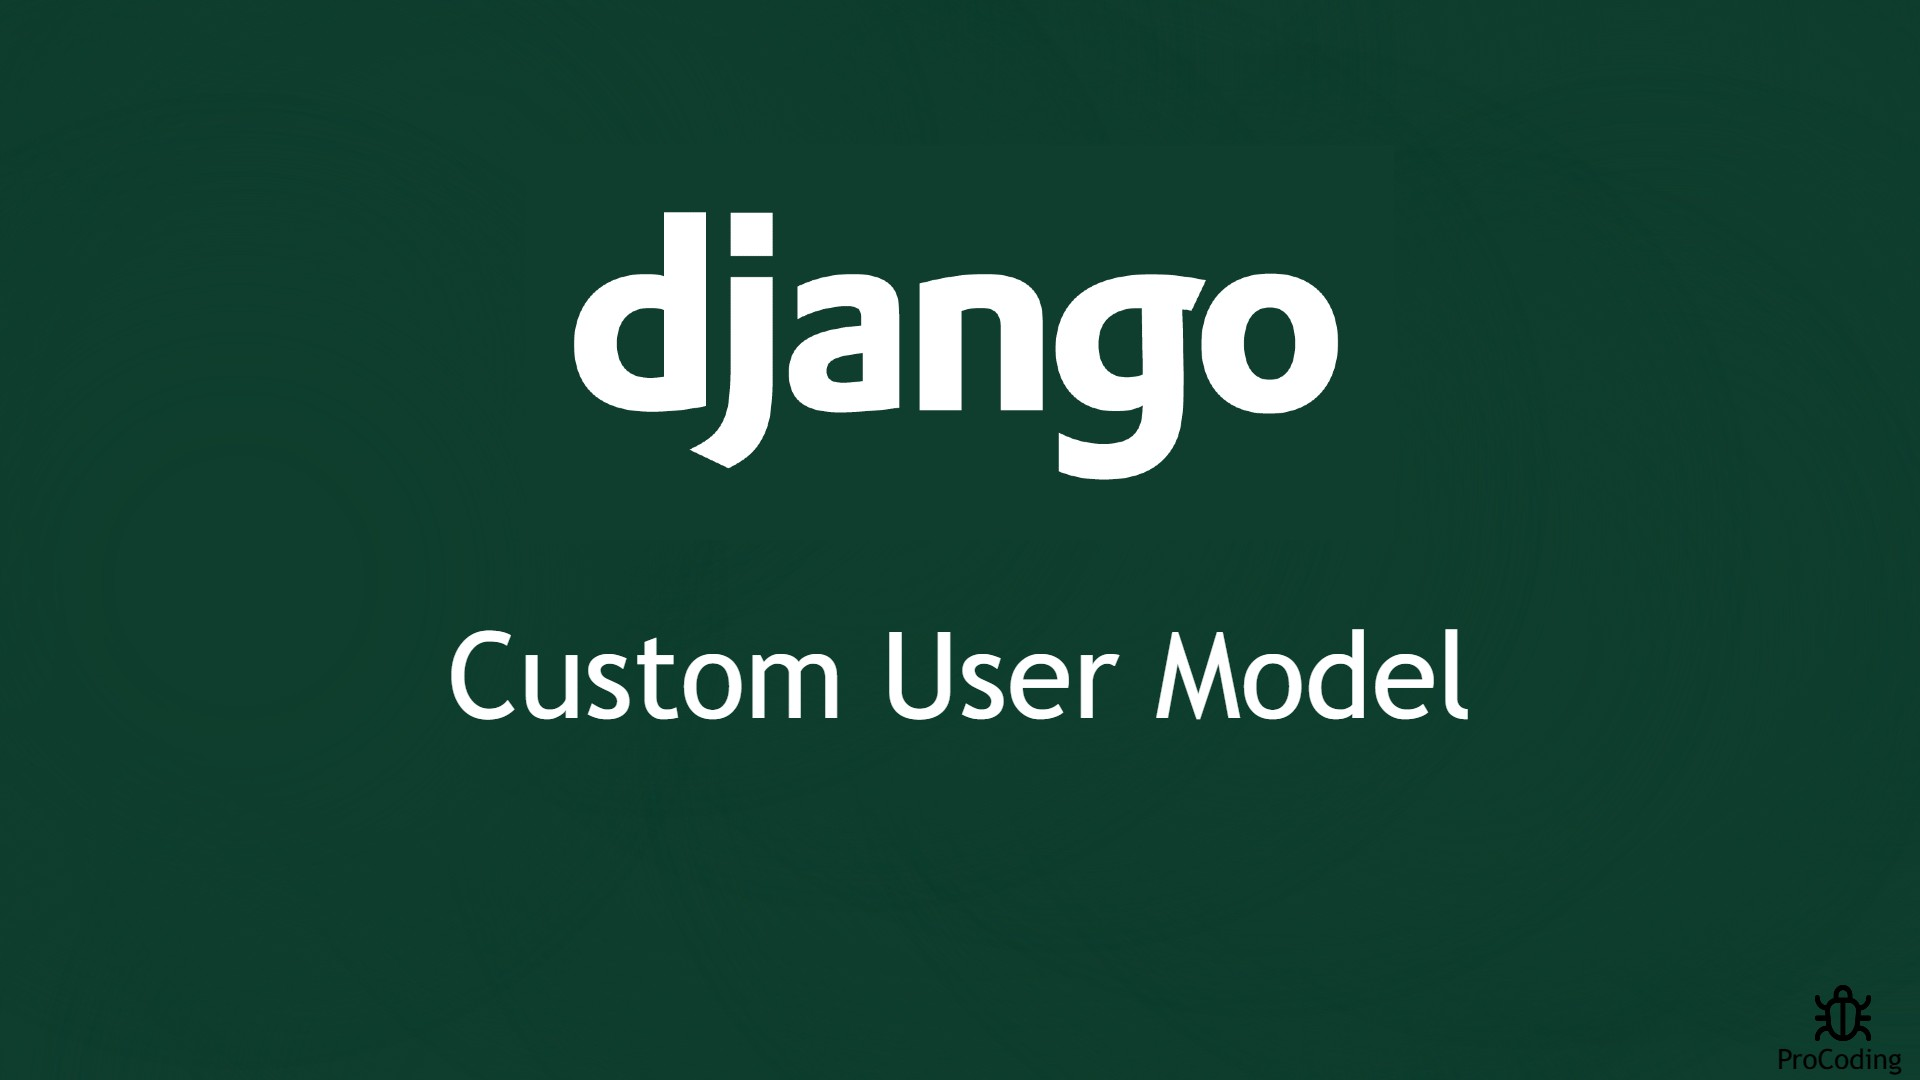 django custom user model